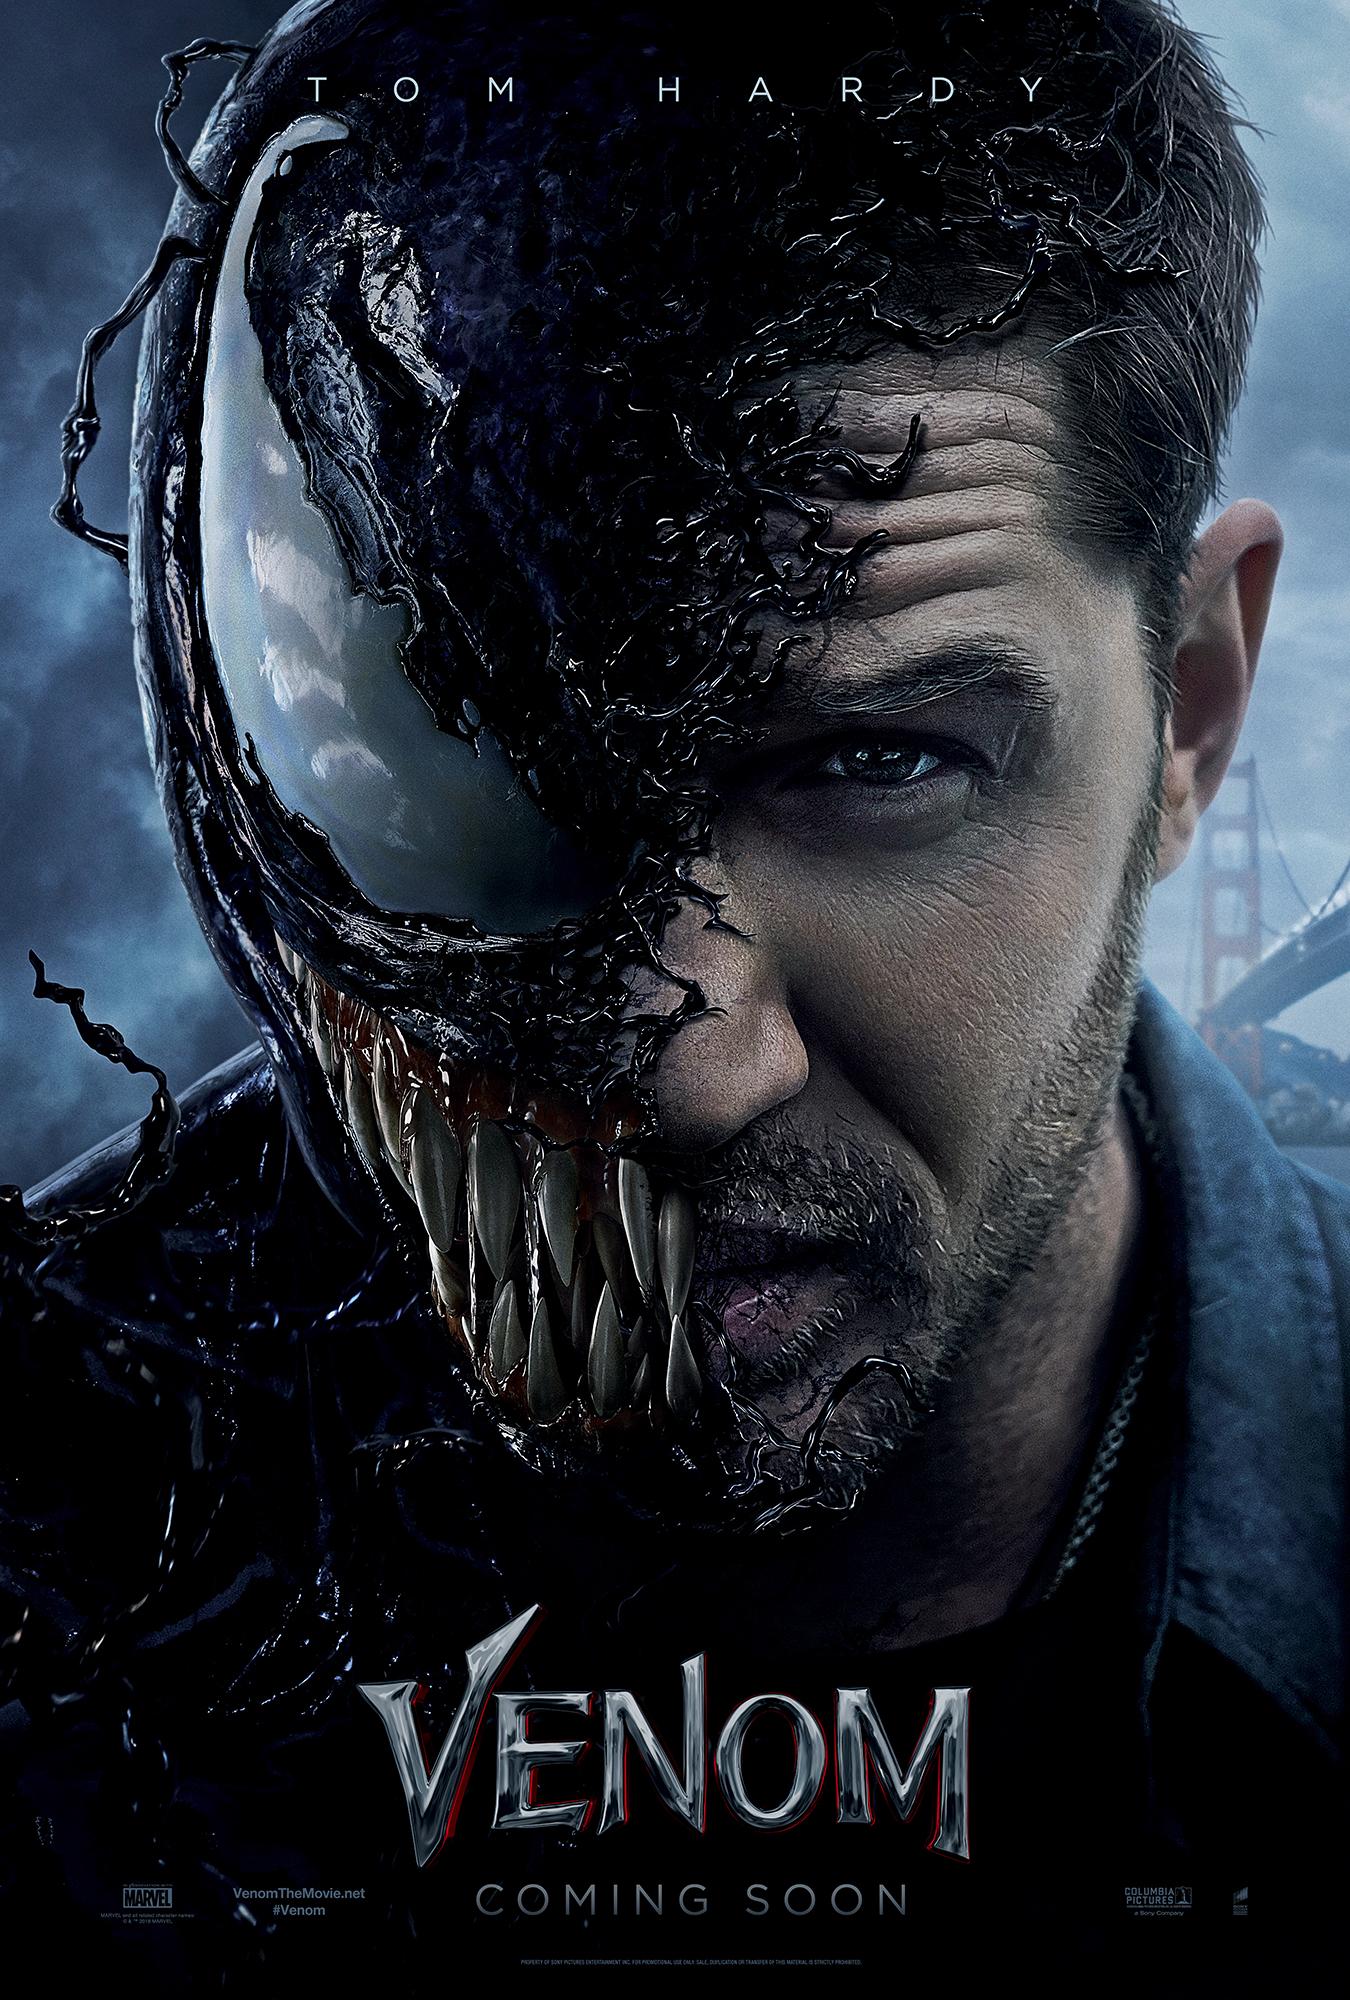 Venom_Teaser_100dpi.jpg